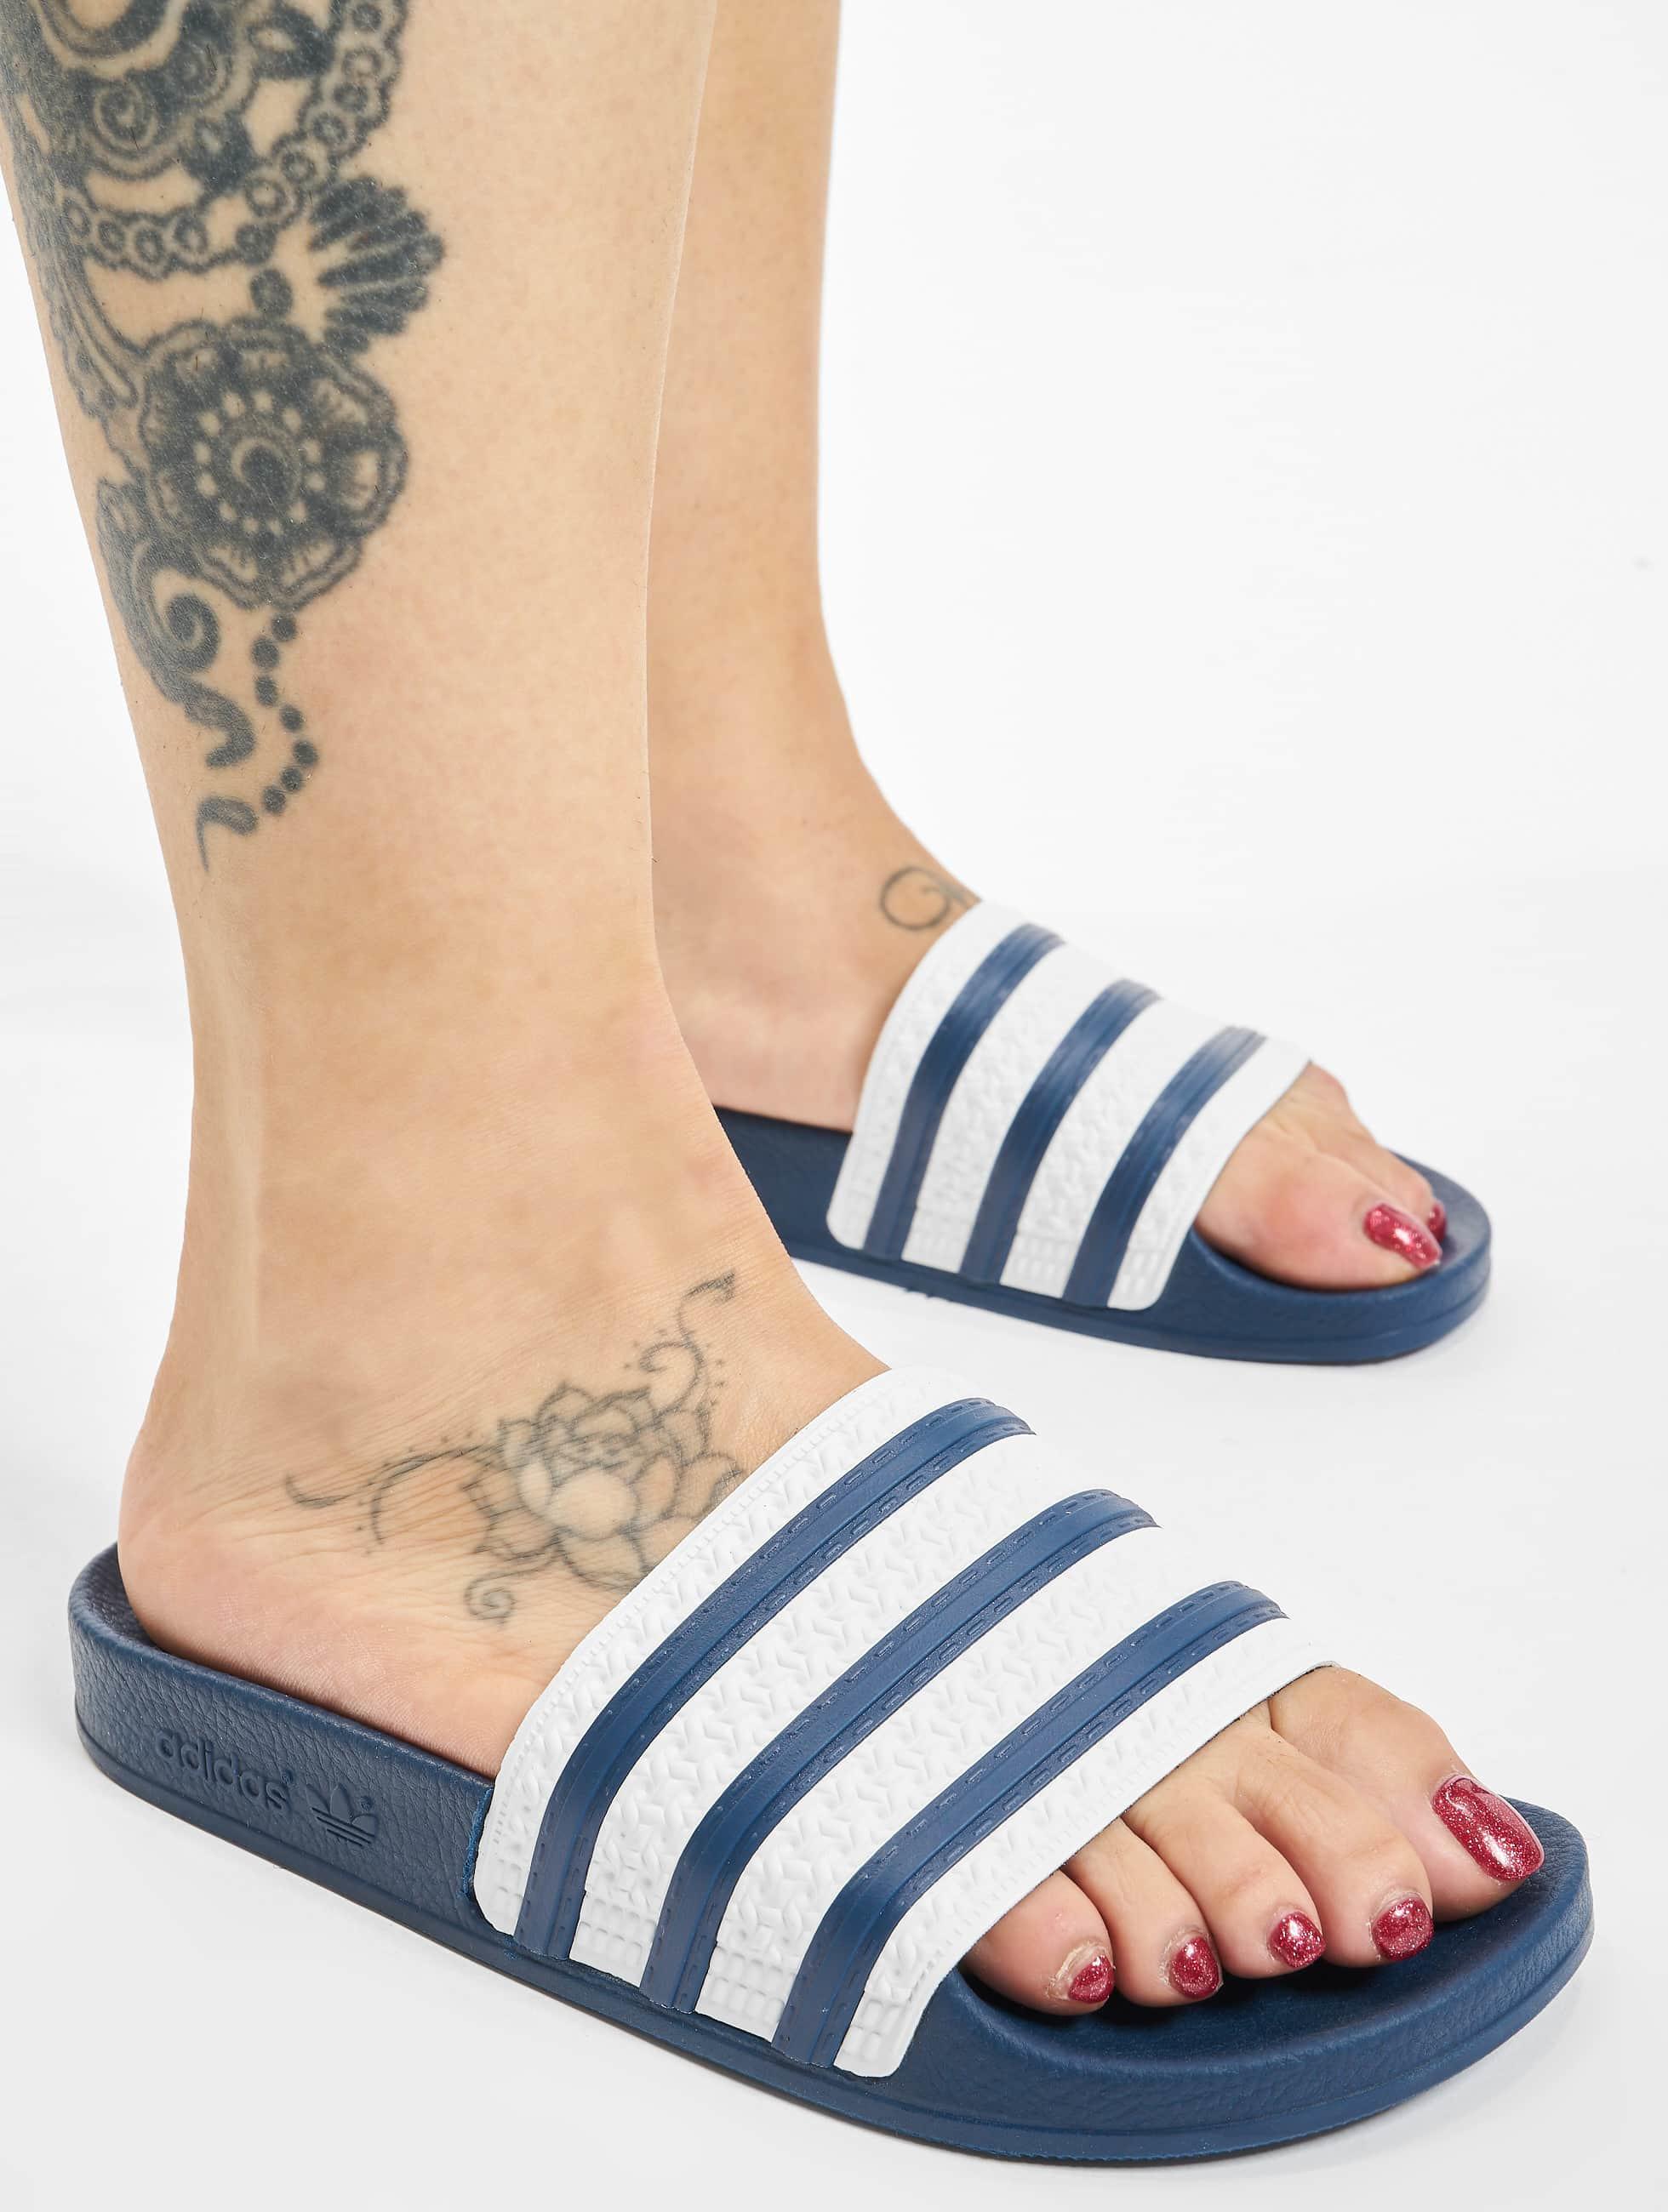 adidas Chaussures / Sandales Adilette en bleu